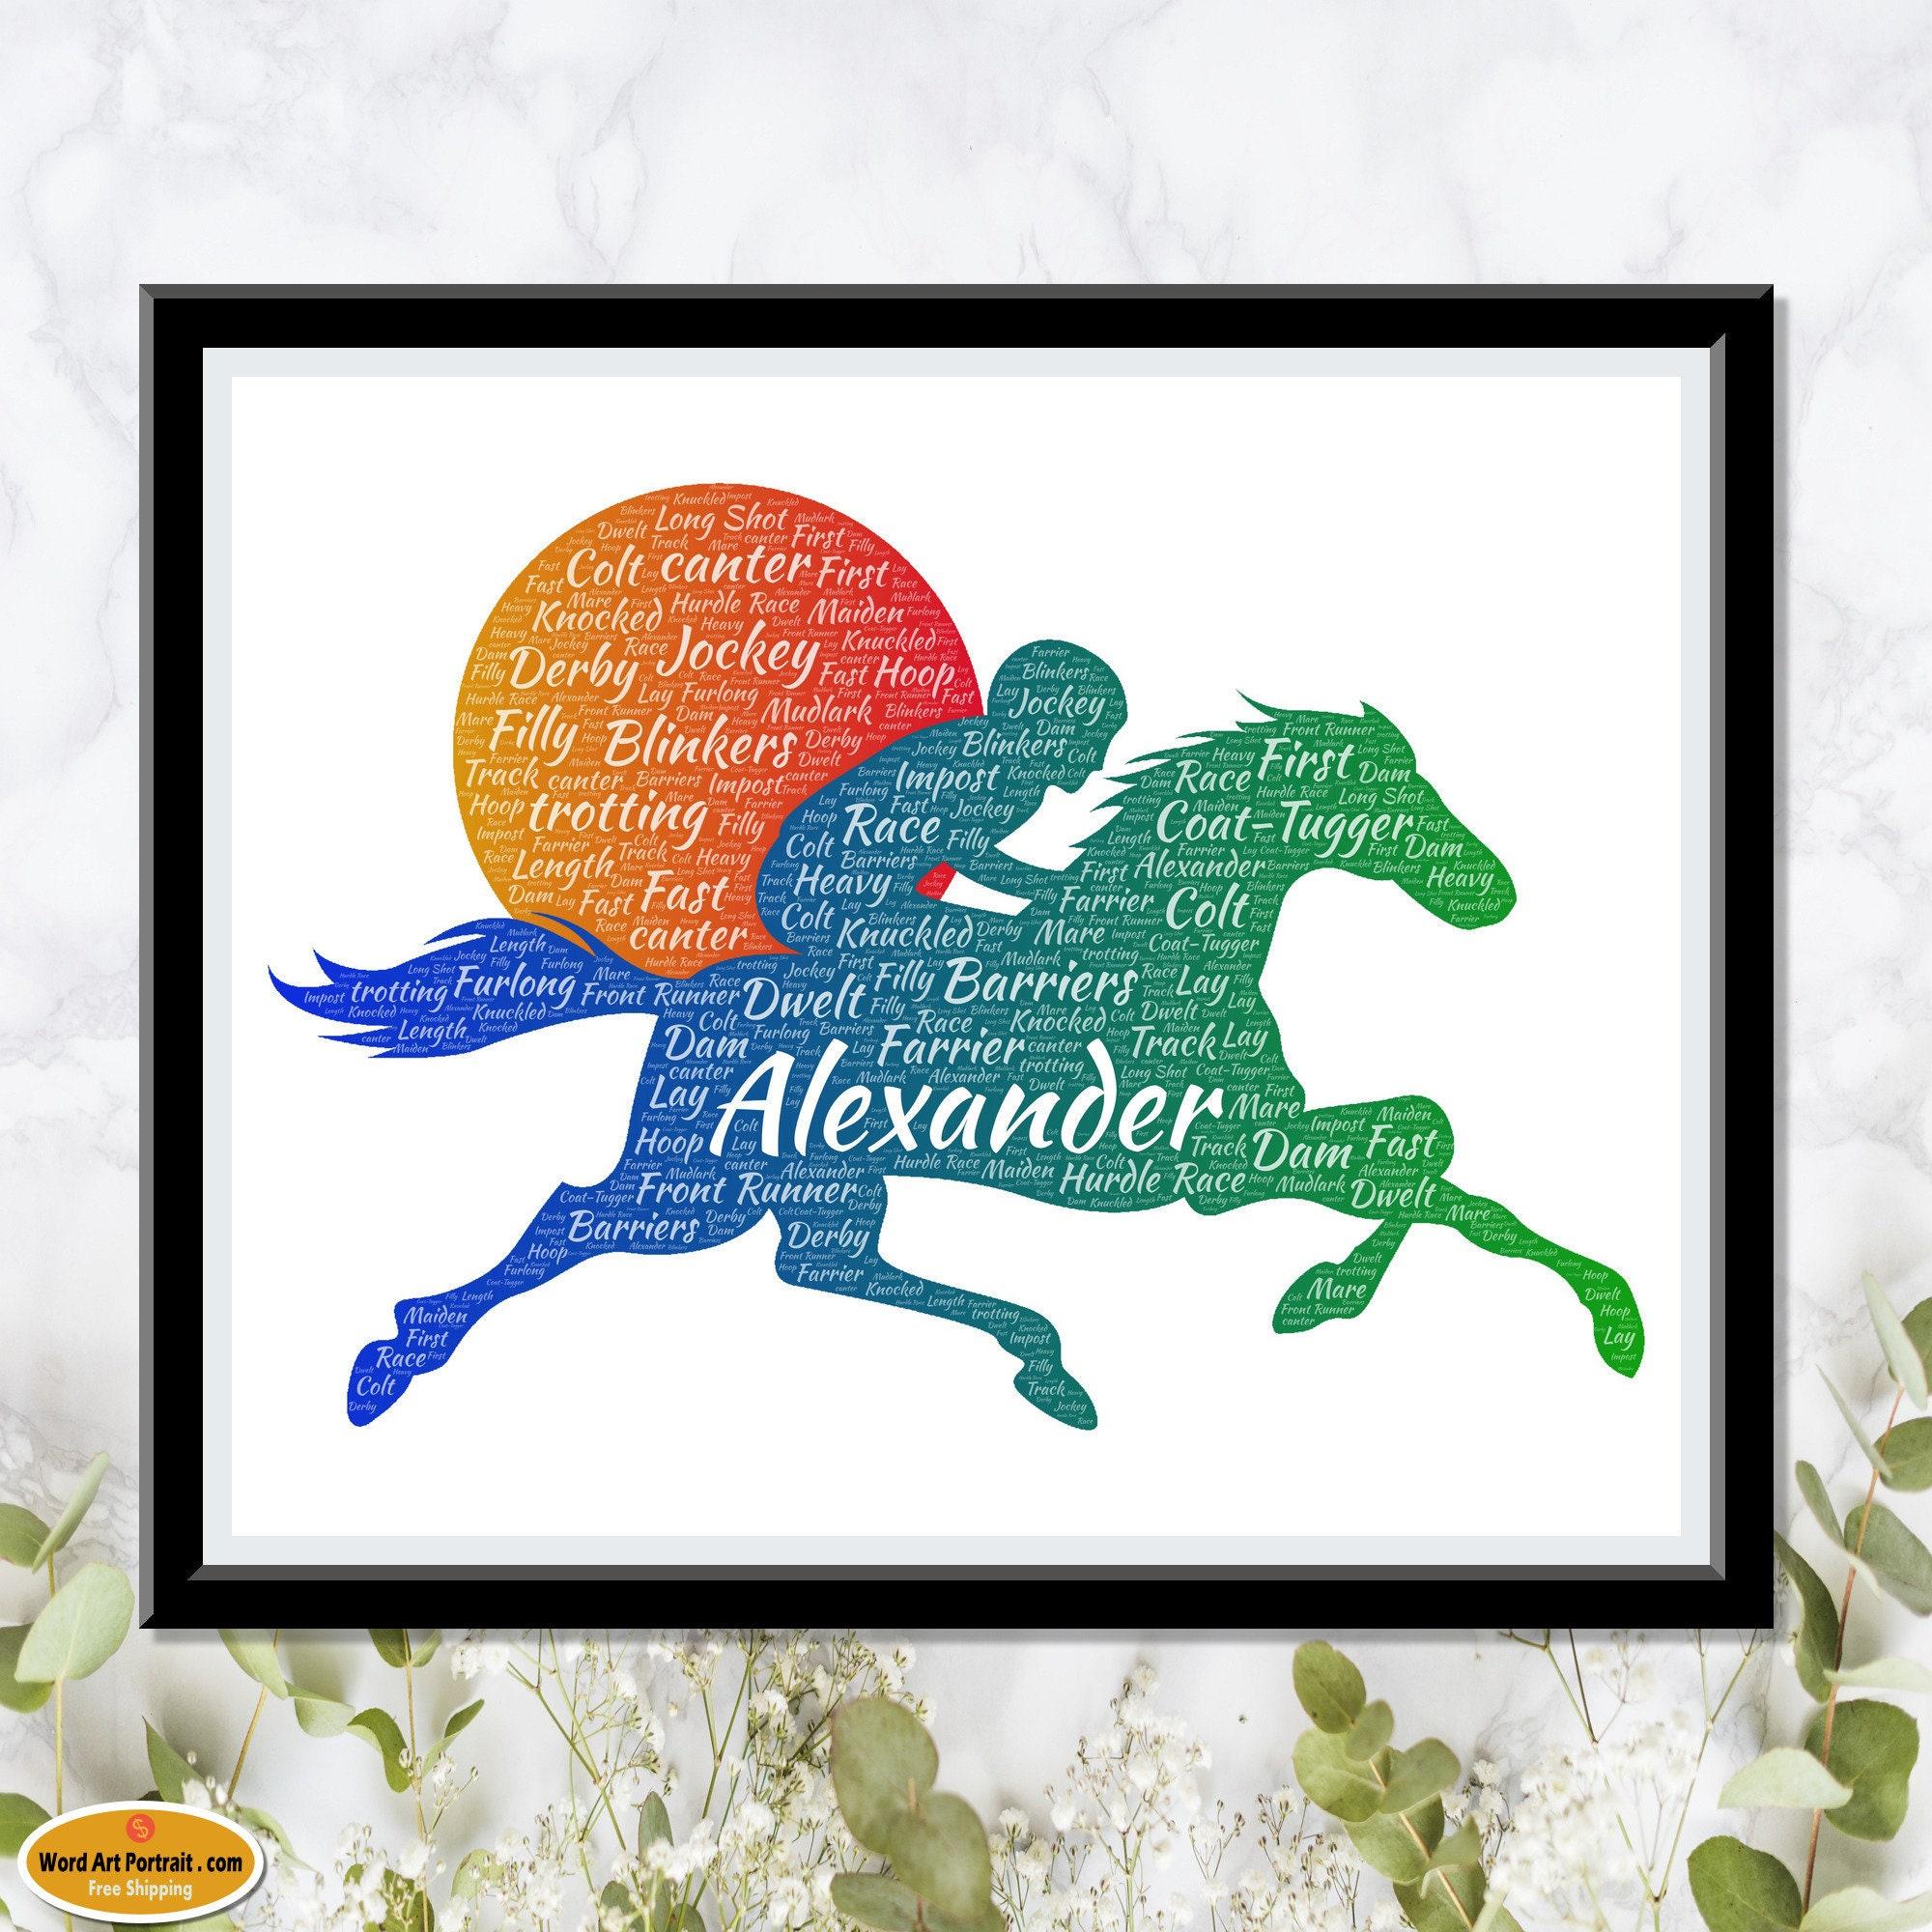 Personalized Horse racing art - Gift for Jockey- Horse racing gift- Brother- Father- Son - Man horse racing prints wall Decor - Word Art